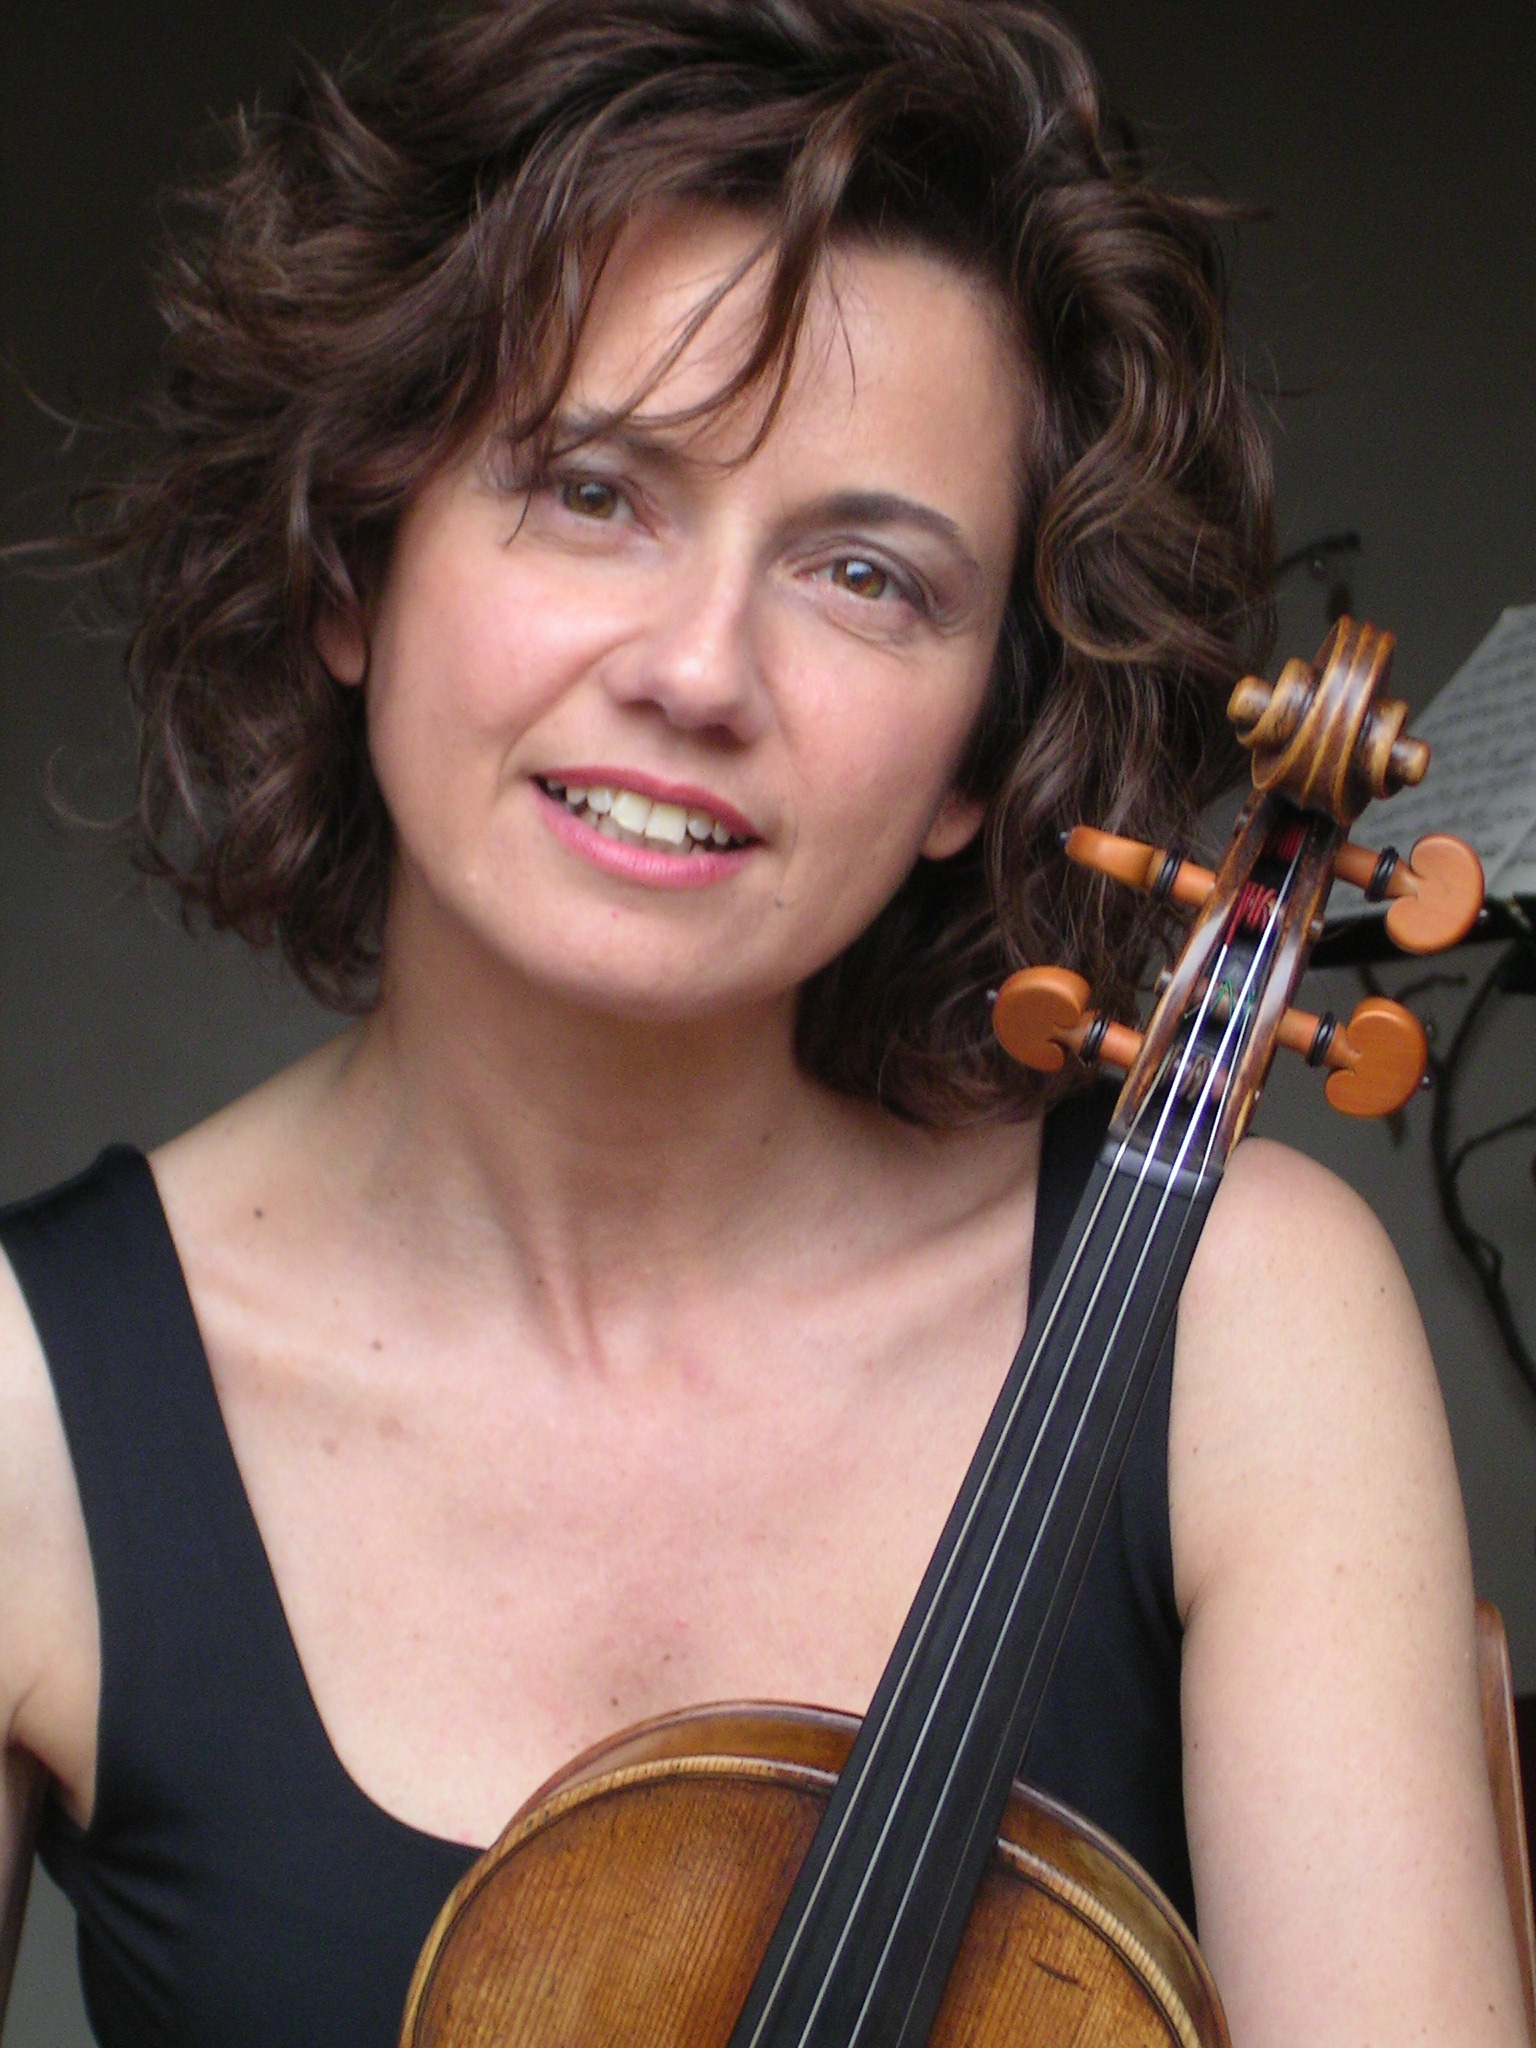 Giovanna Polacco